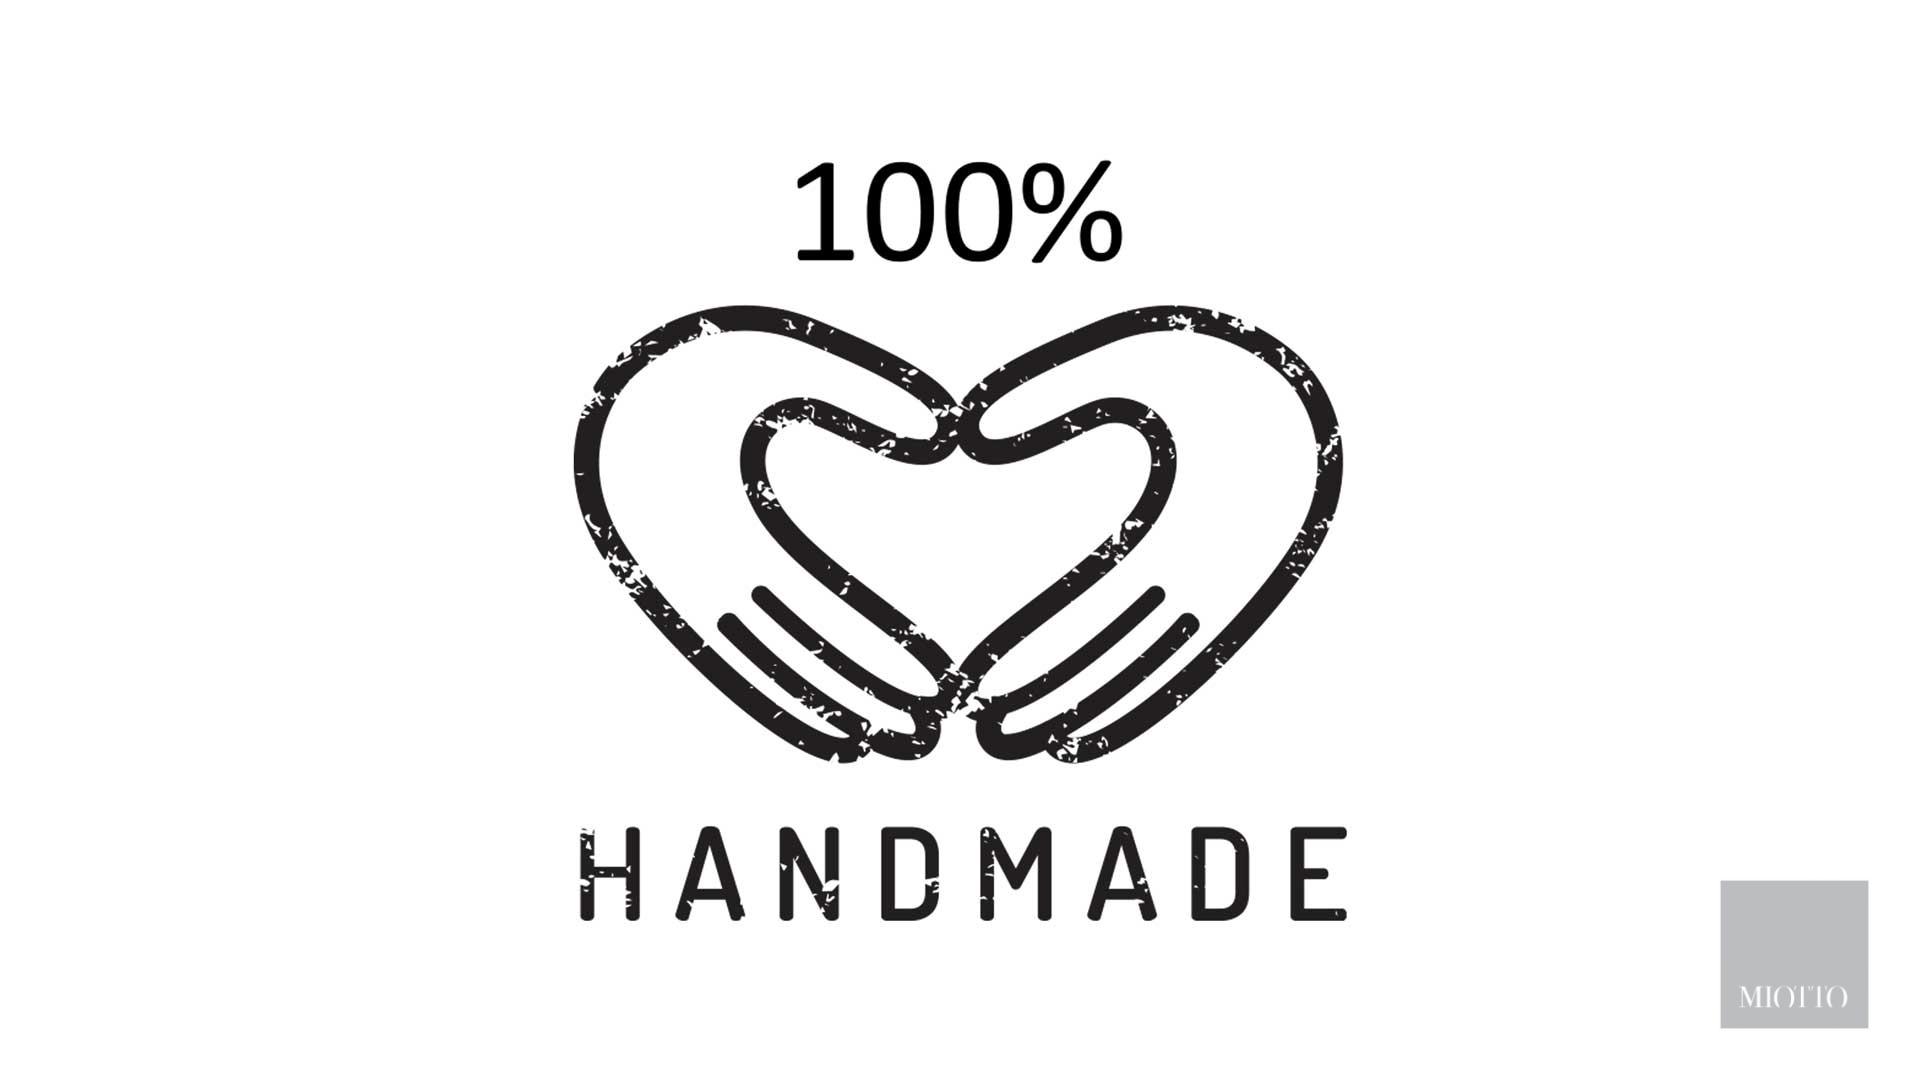 miotto_handmade-logo_web